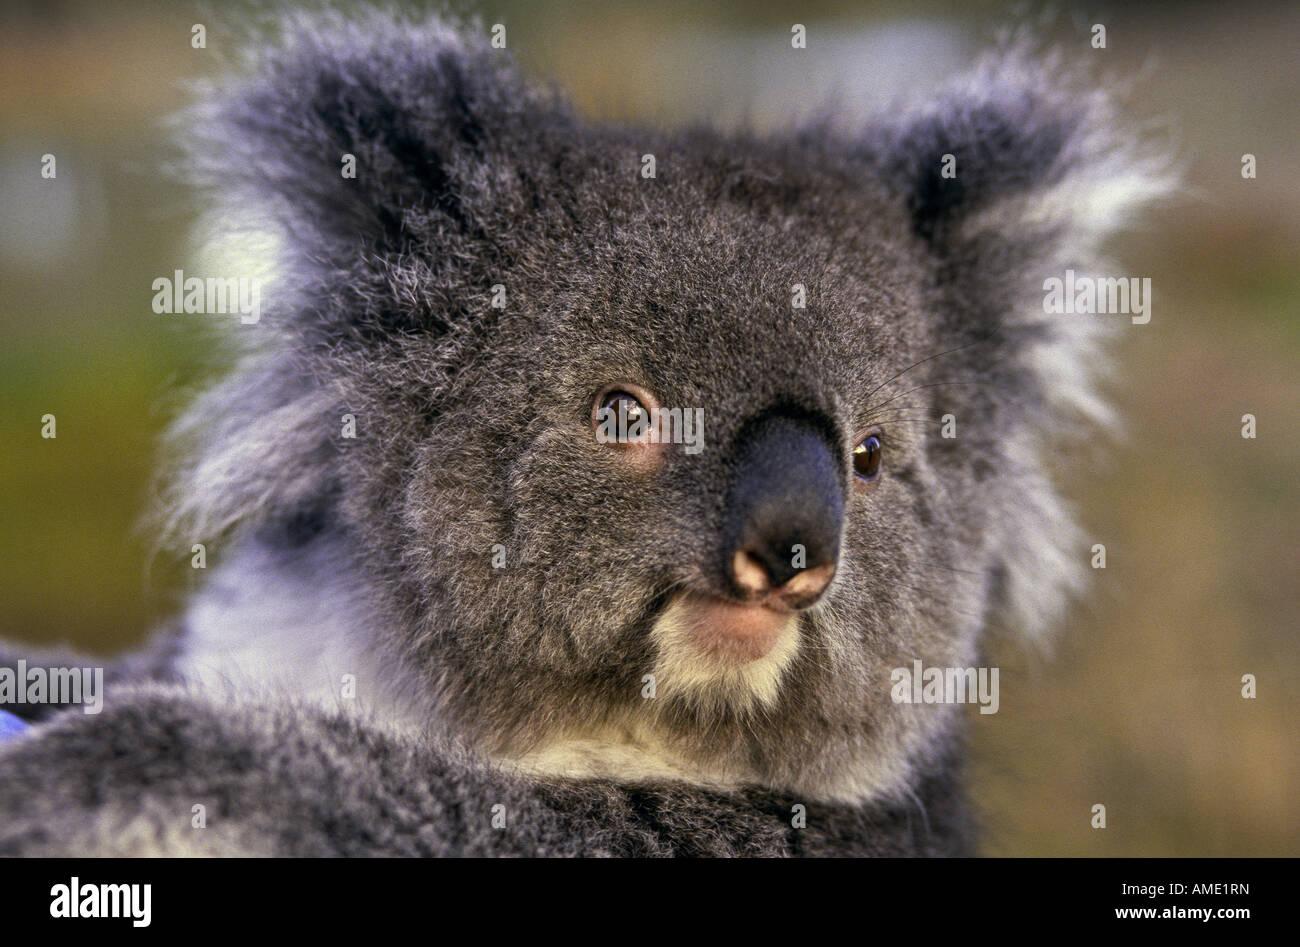 Koala, Australia - Stock Image